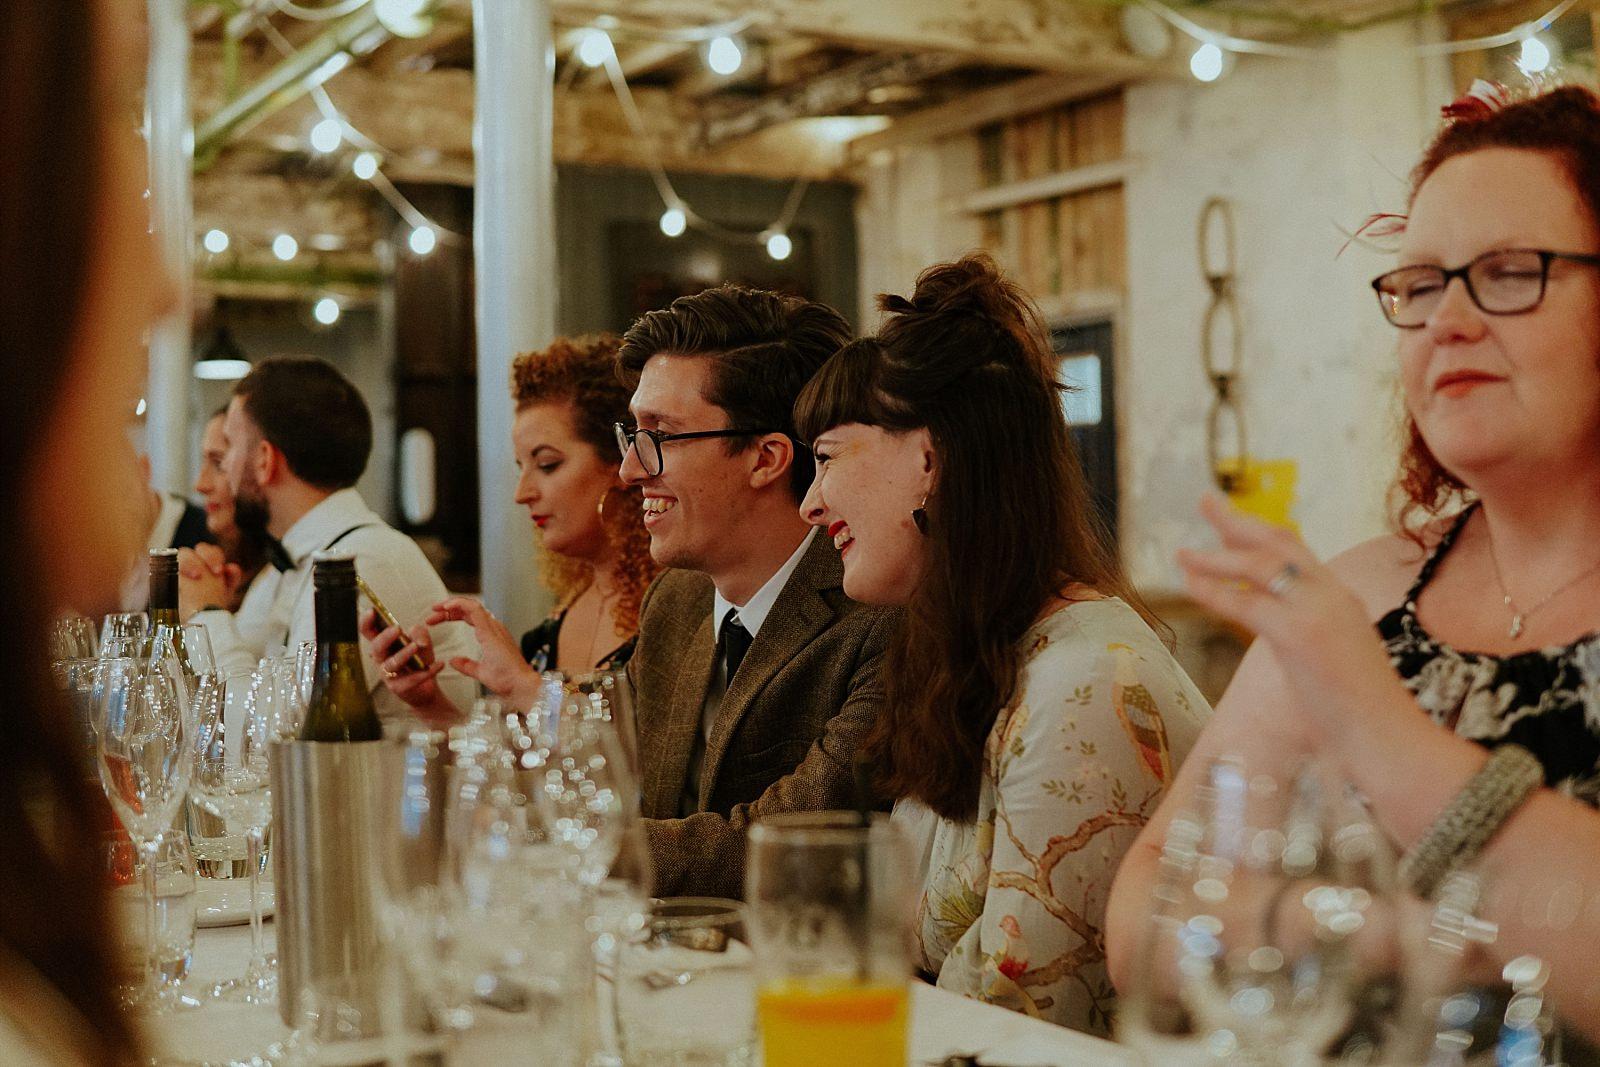 happy guests at wedding meals